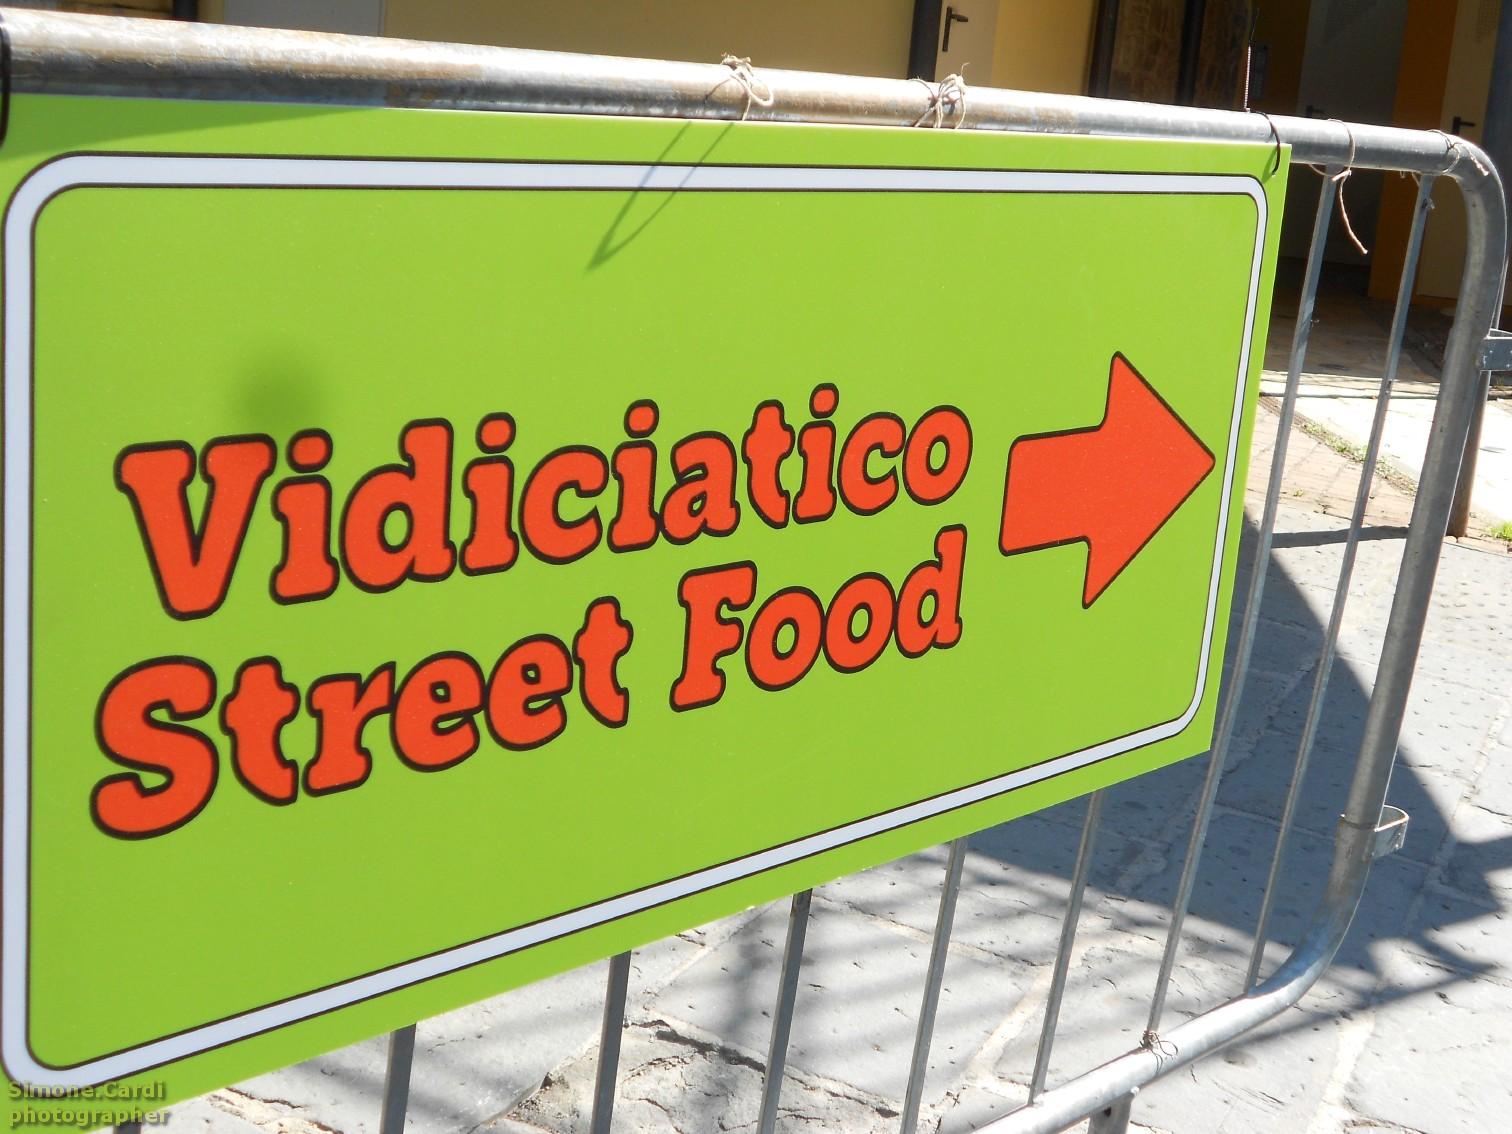 Vidiciatico Street Food cartello